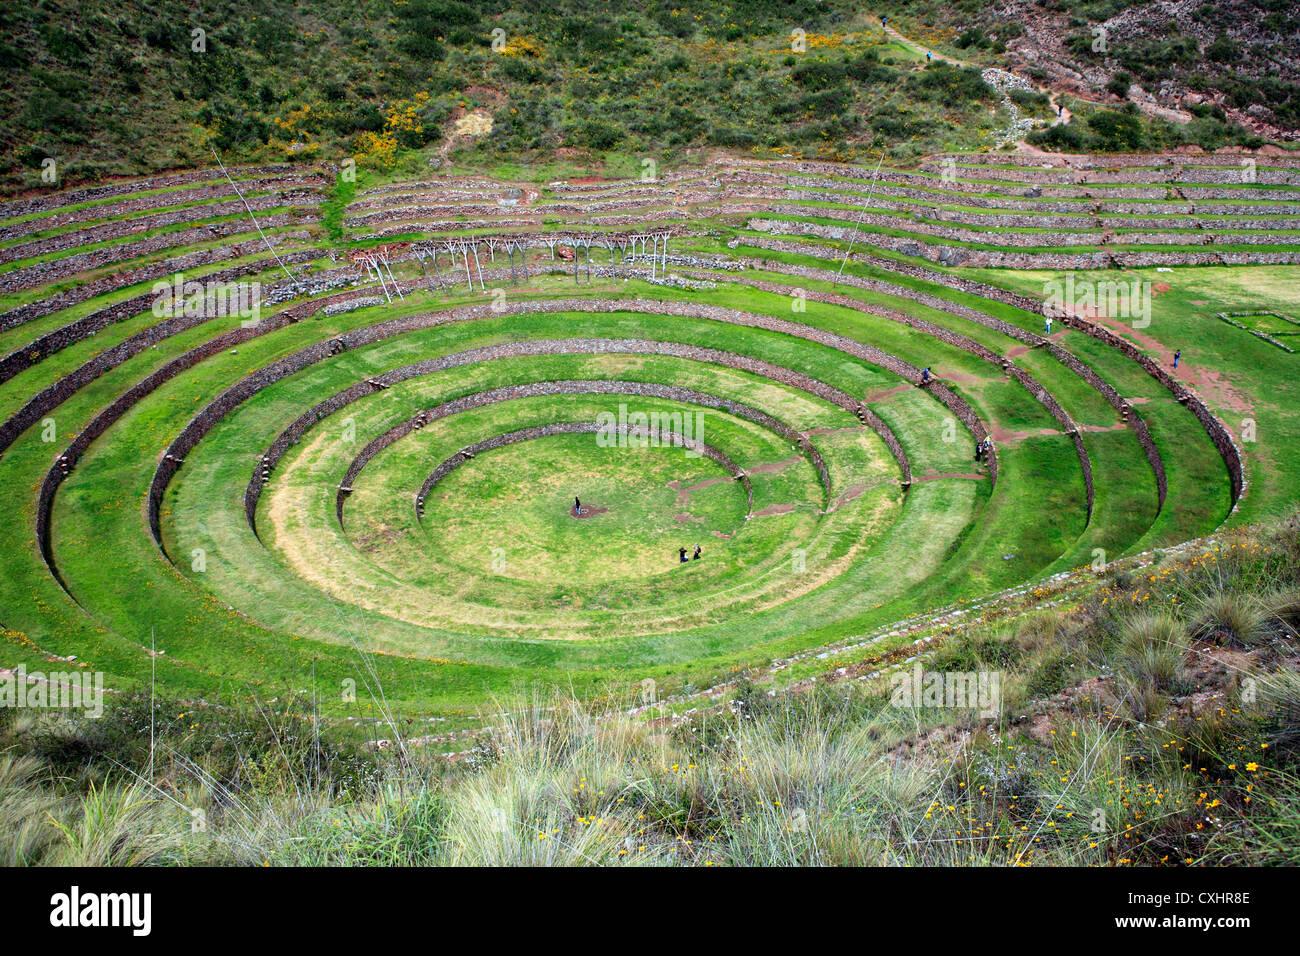 Moray, archaeological site, Cuzco, Peru - Stock Image